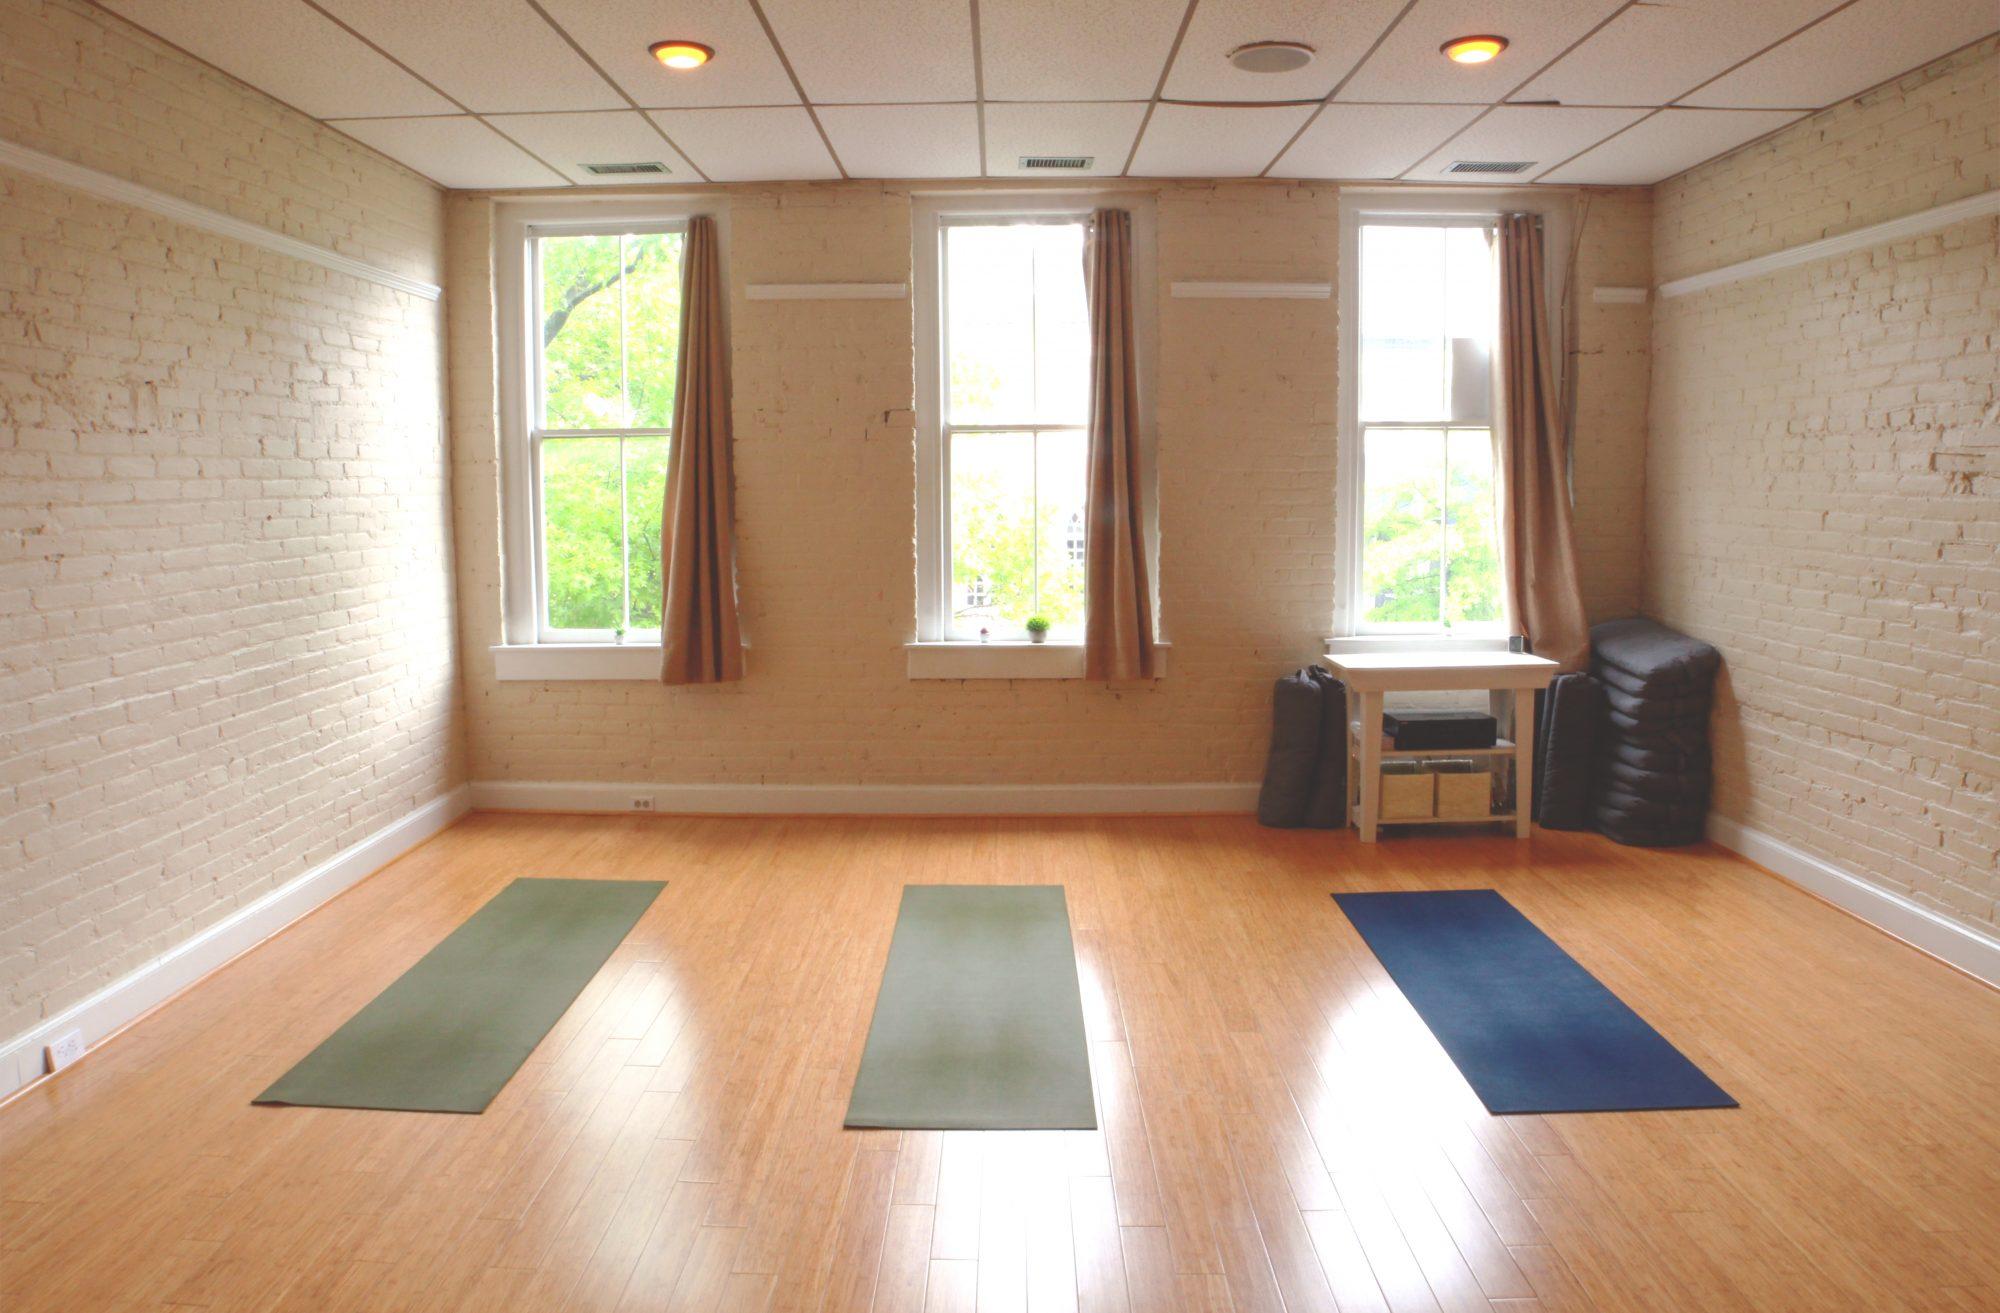 Yoga Studio Alexandria Rental Space Yoga Studios Near Me